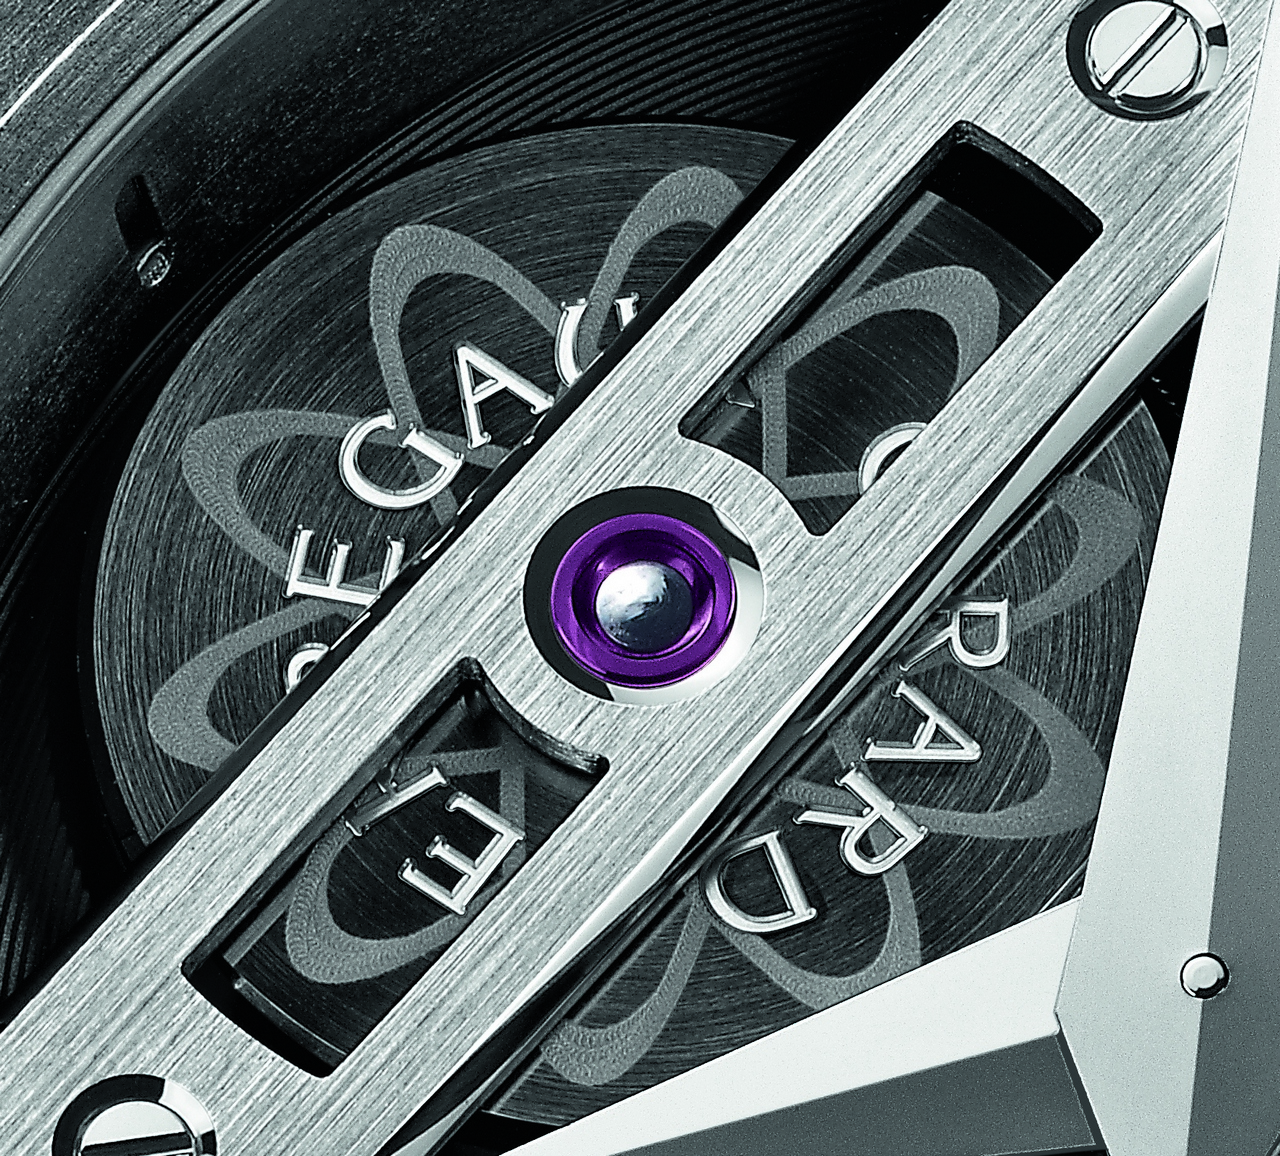 baselword-2013-girard-perregaux-tourbillon-bi-axial-titane-dlc_0-100 3